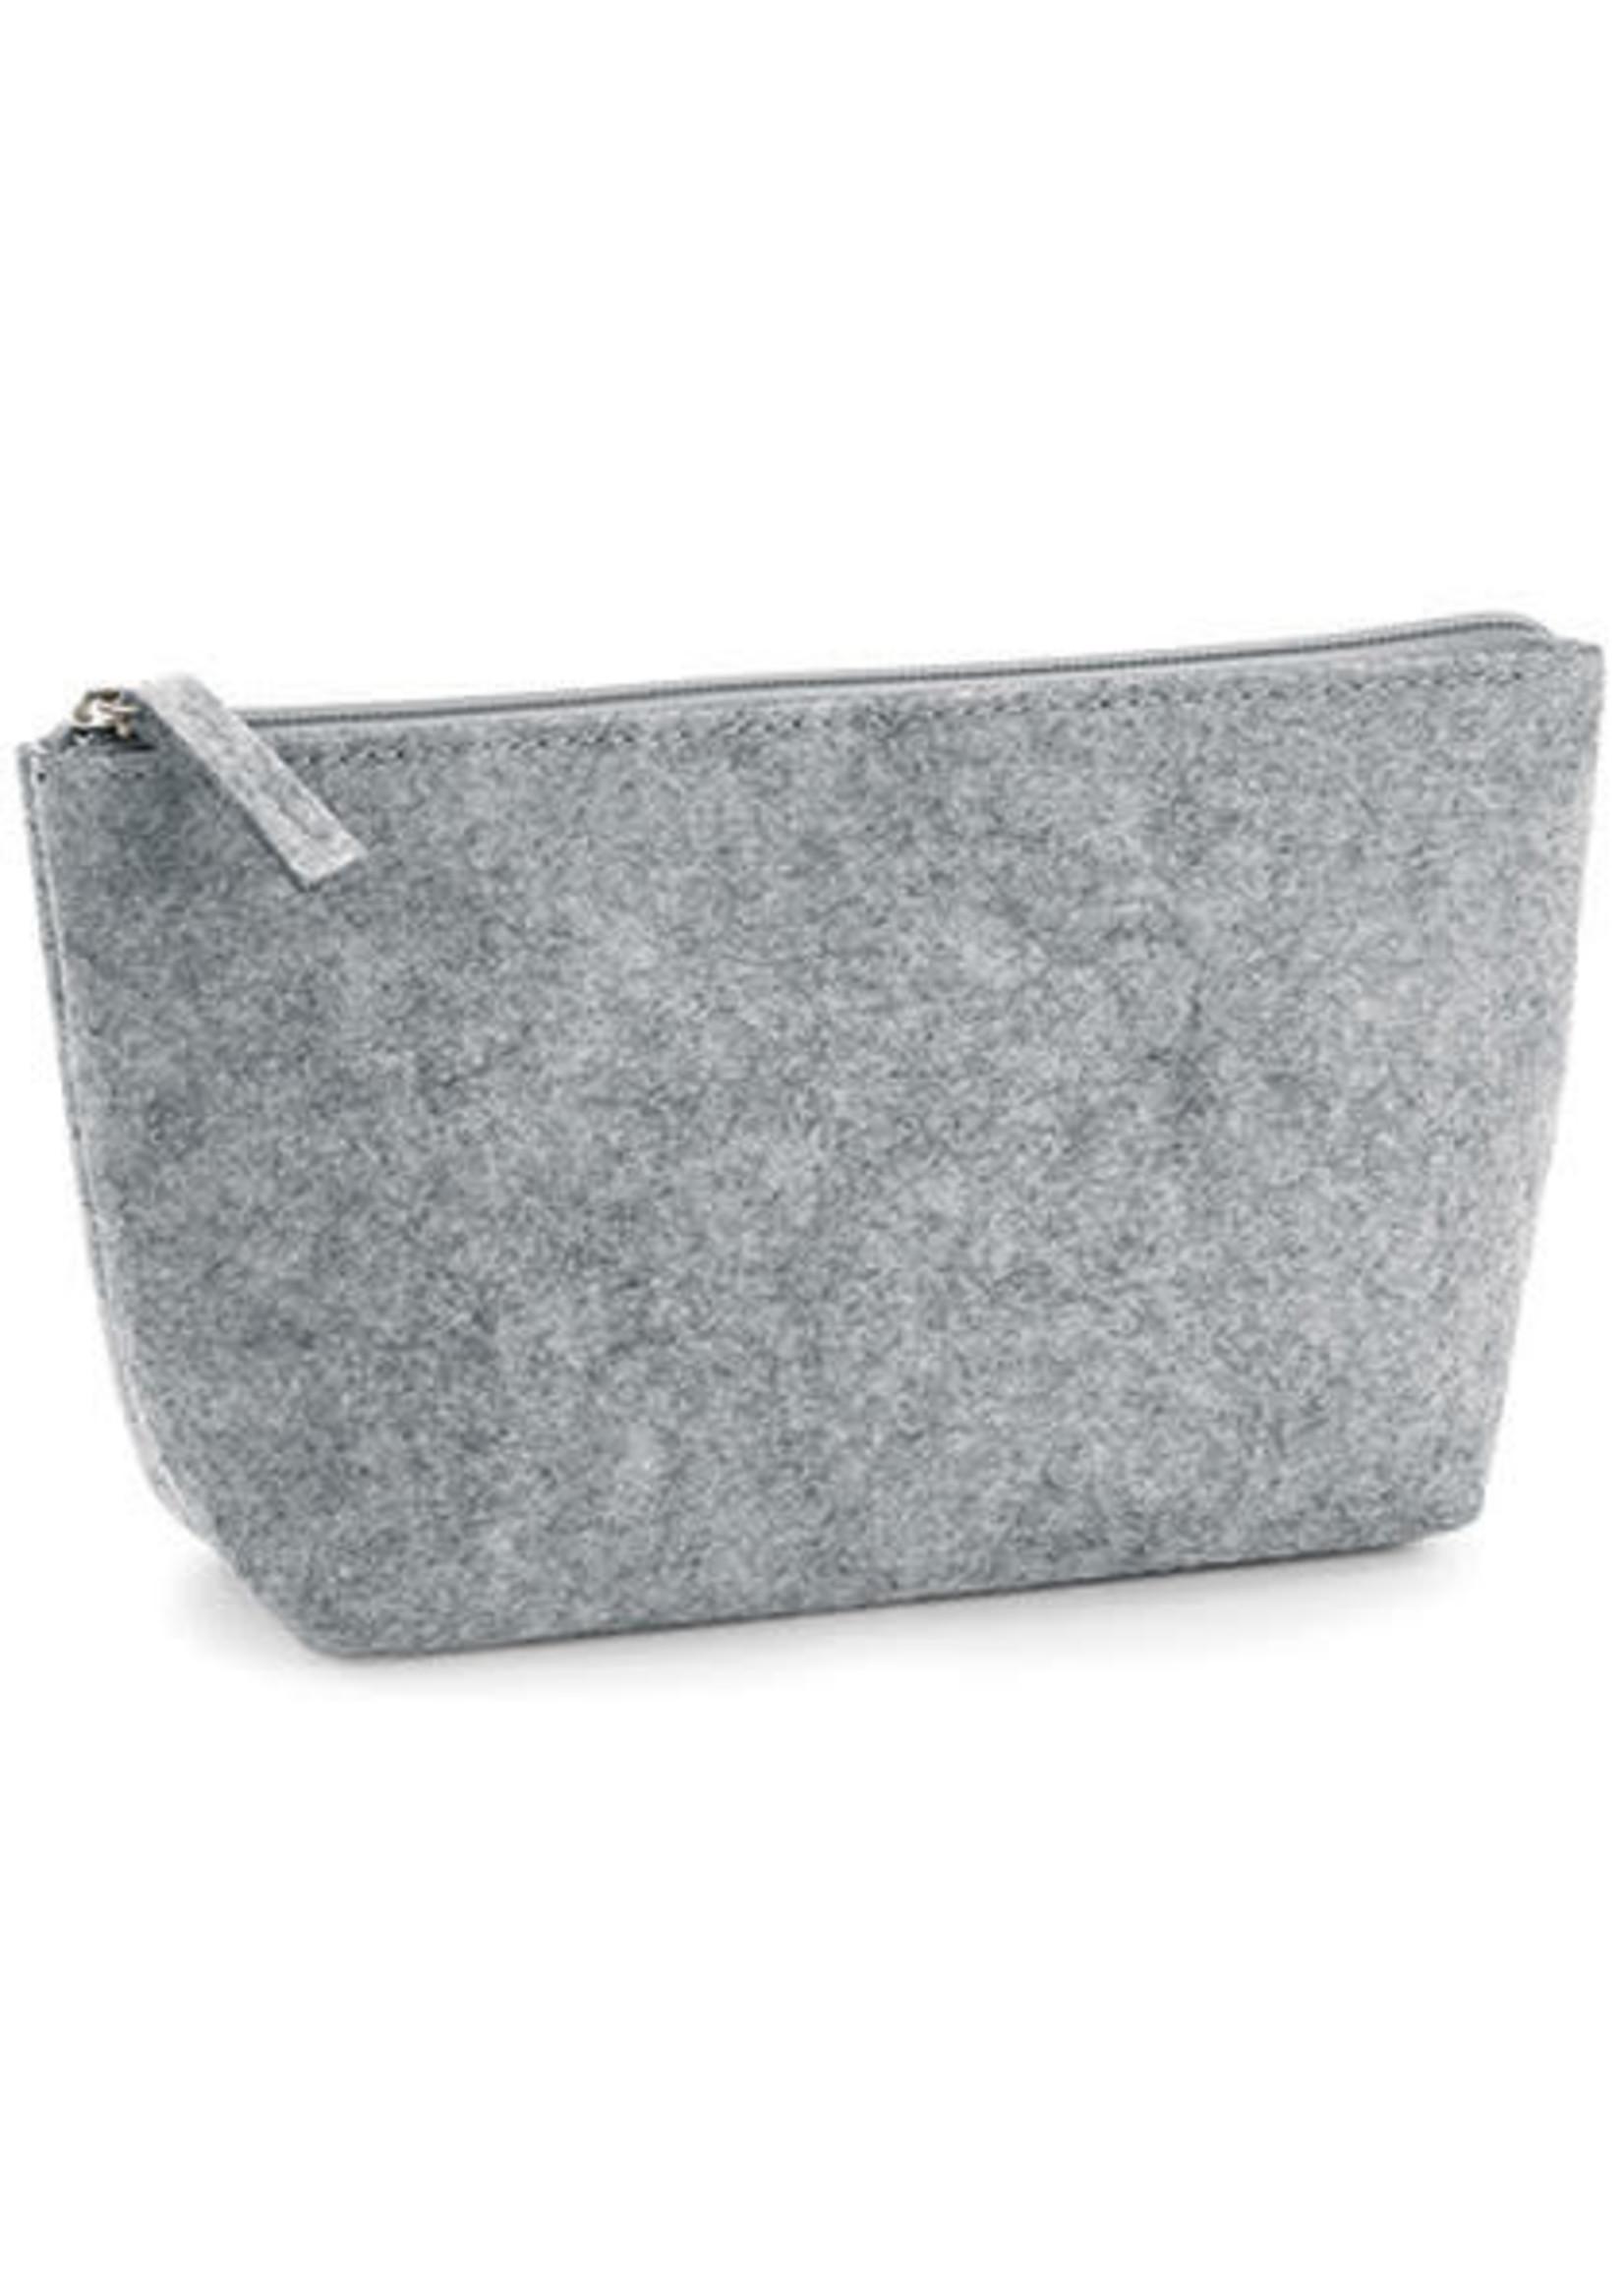 Felt Accessory Bag - Grey Melange - S